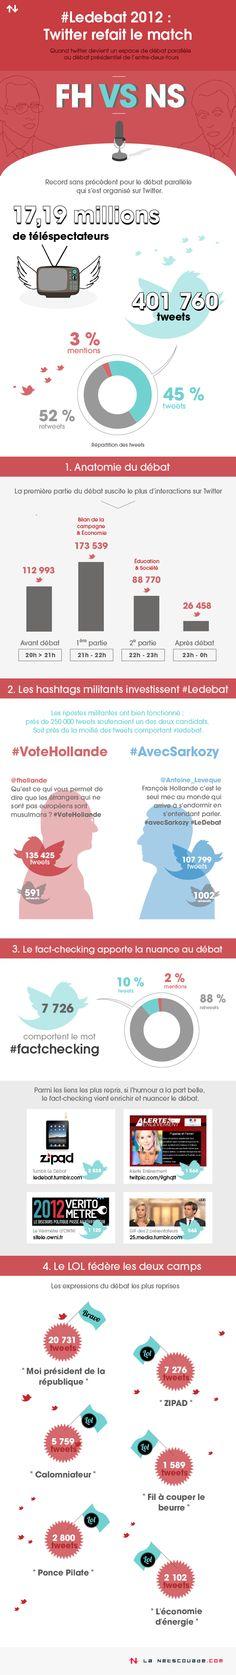 #lanetscouade #twitter #politique #debat #TV